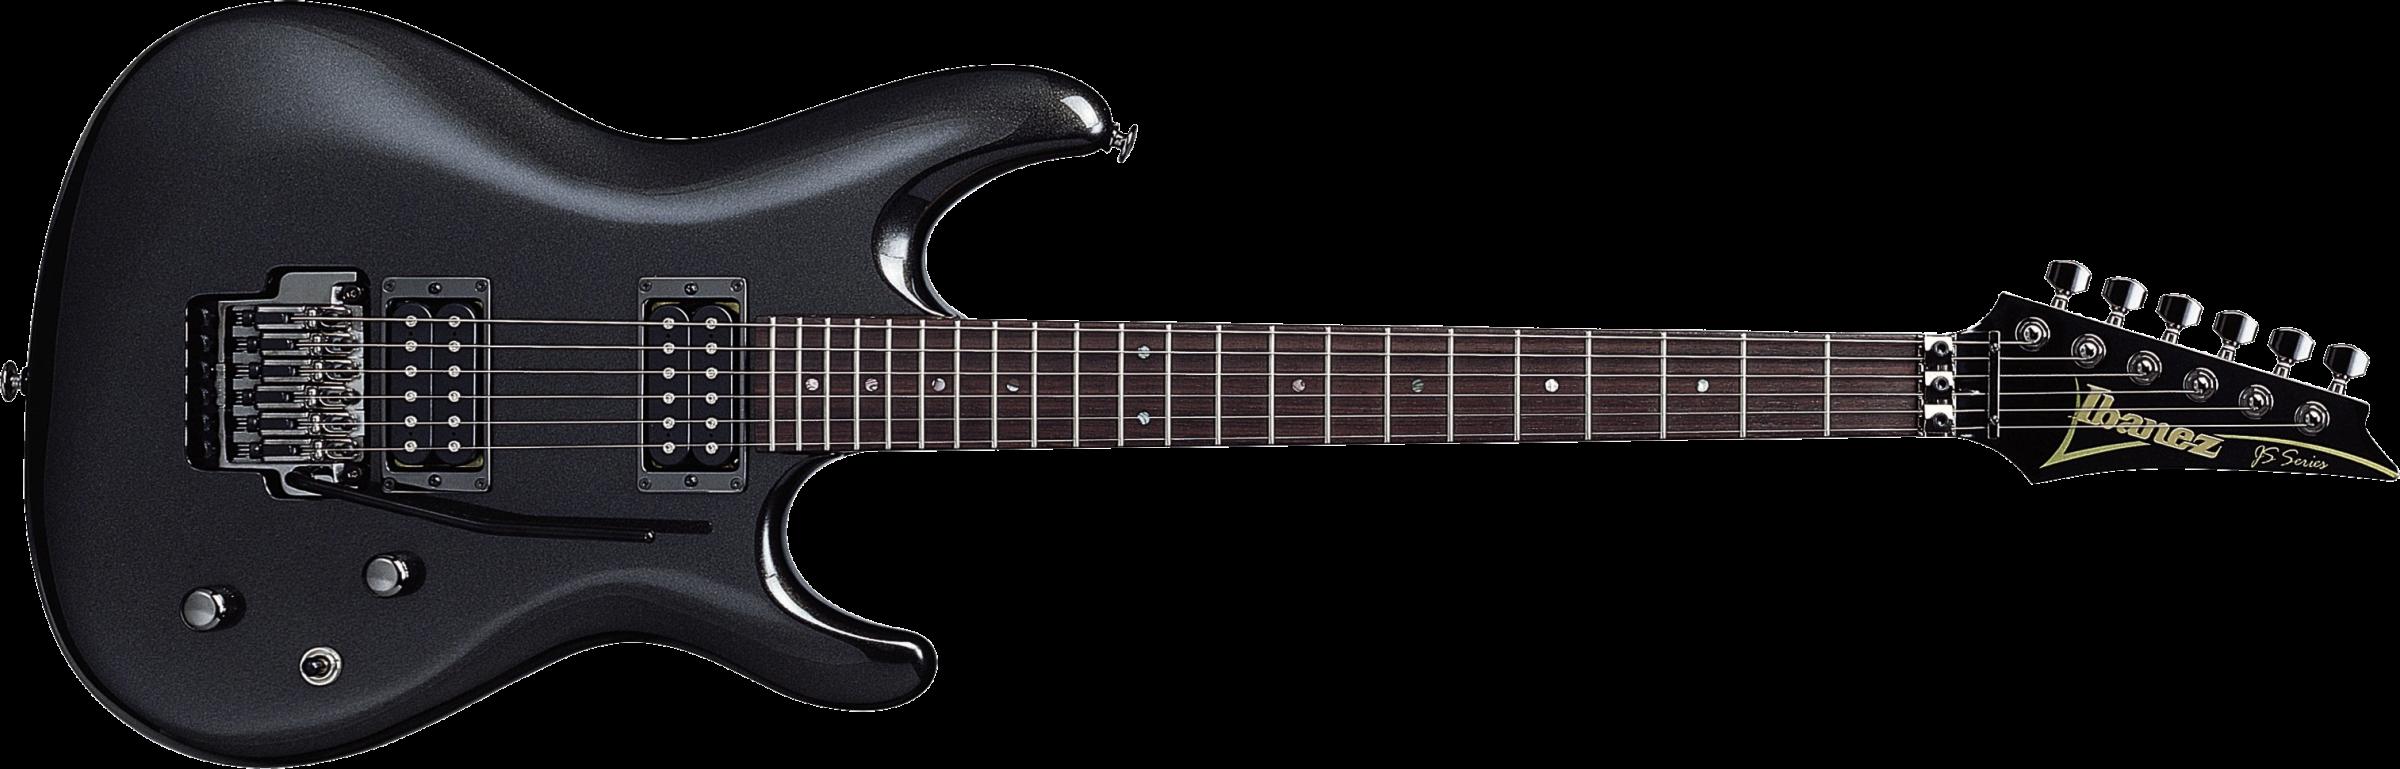 Ibanez JS1000 signature Joe Satriani JS